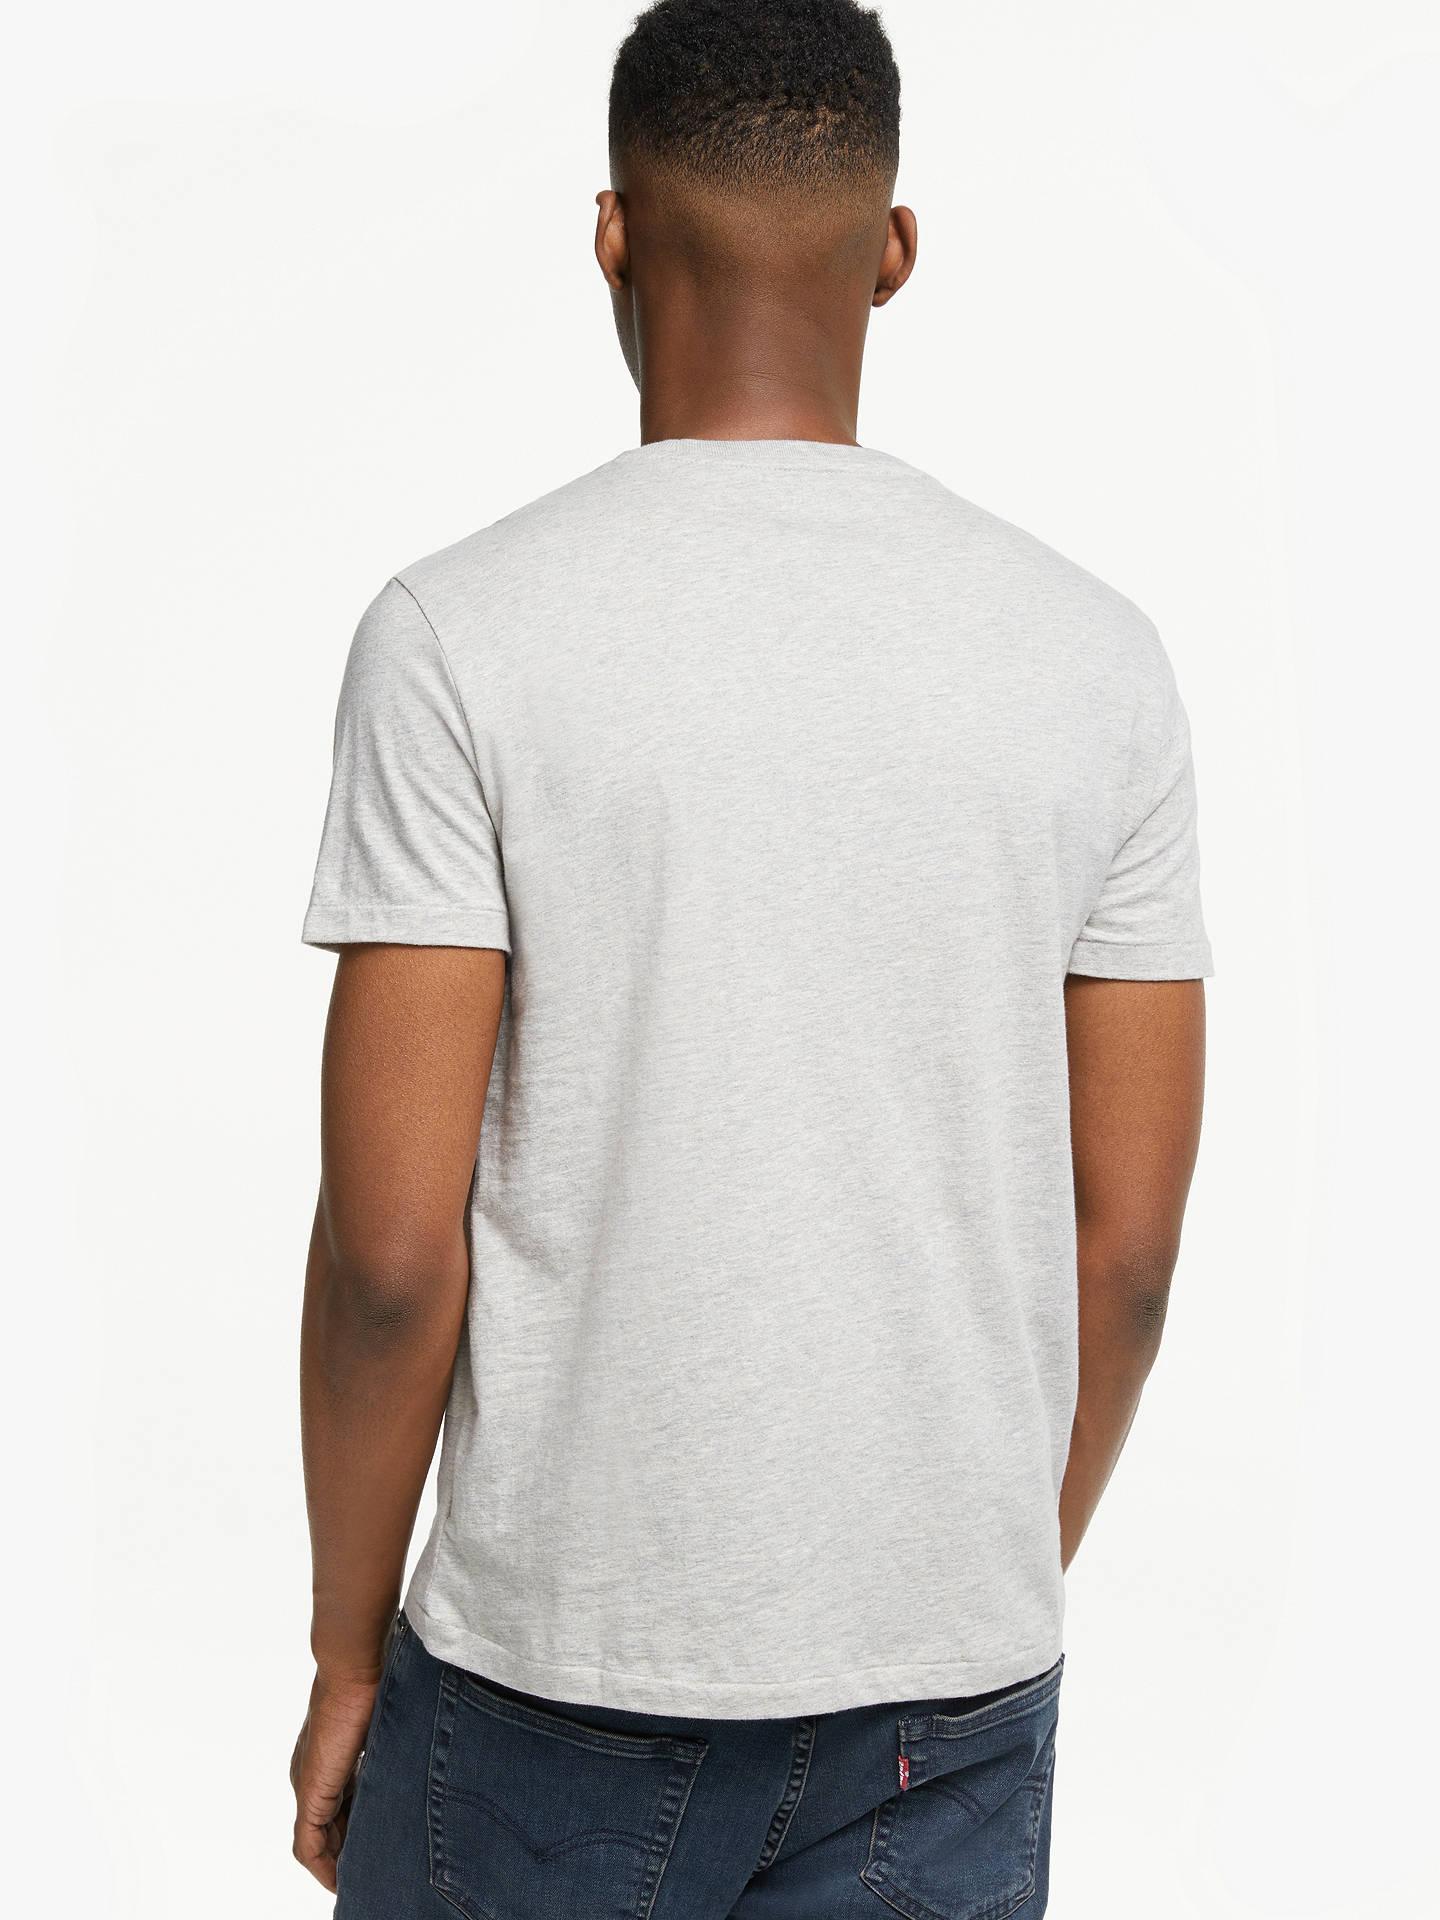 bb7fdf38f ... Buy Polo Ralph Lauren Short Sleeve Custom Fit Crew Neck T-Shirt, New  Heather ...